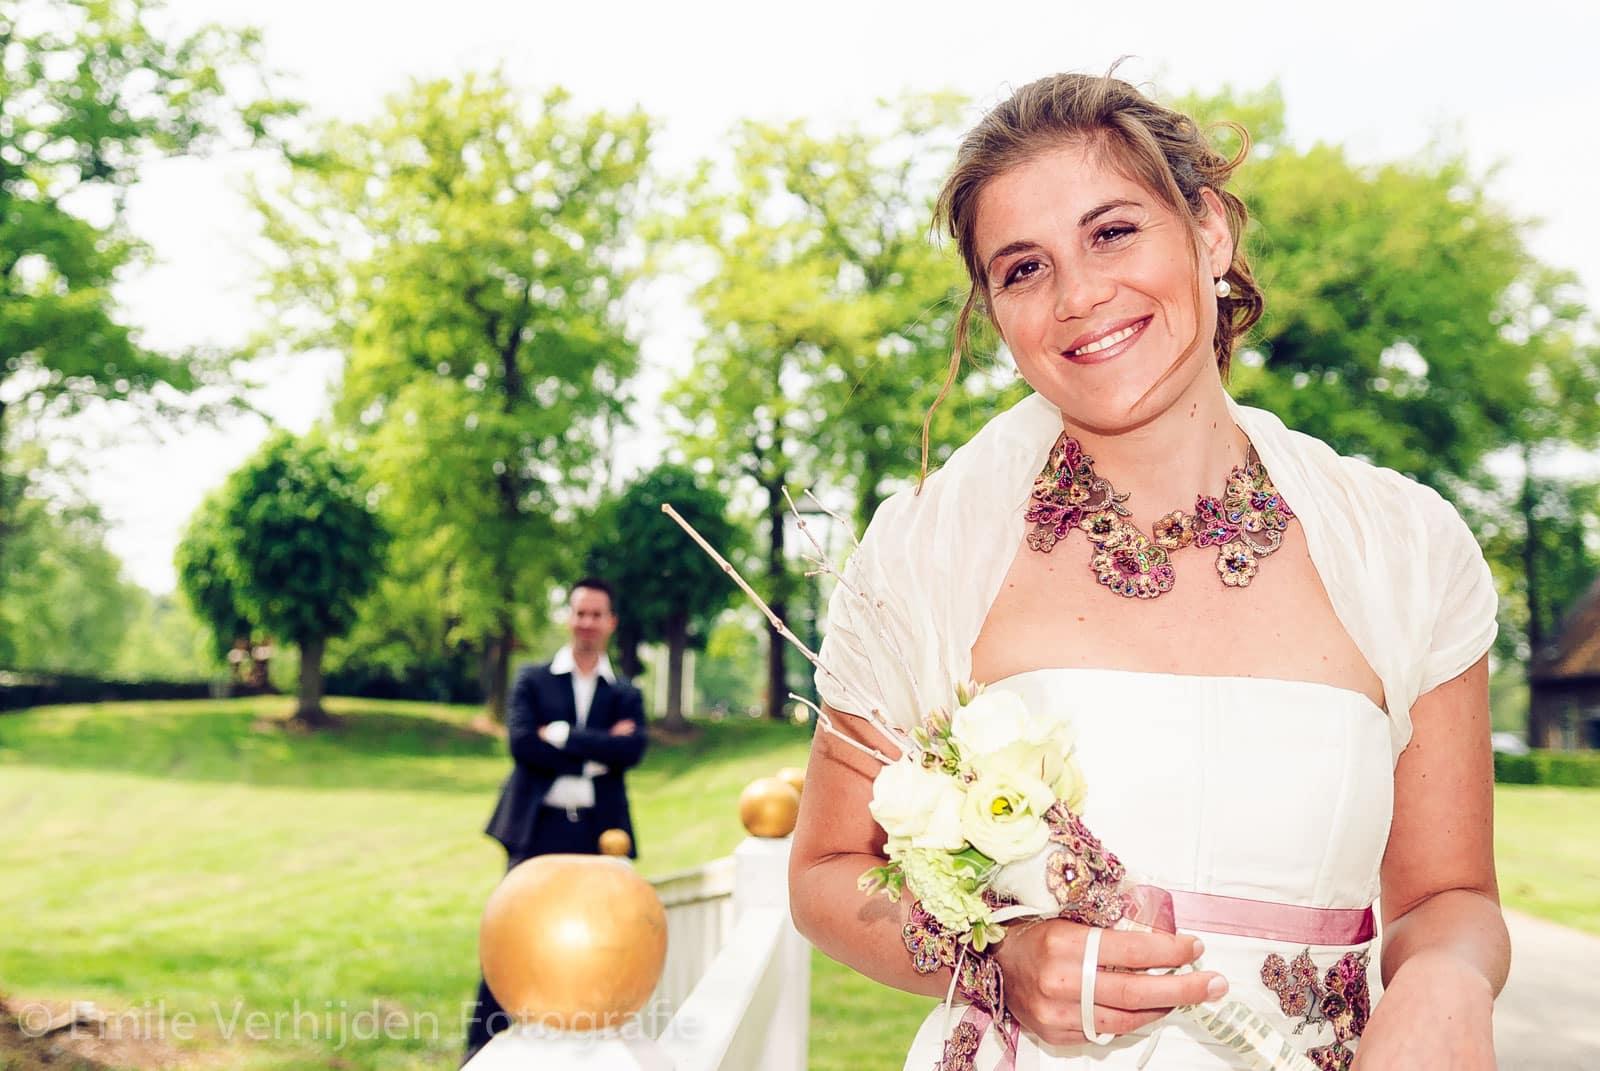 Bruidsfotograaf Limburg - scherpte diepte foto met stralende bruid op voorgrond.